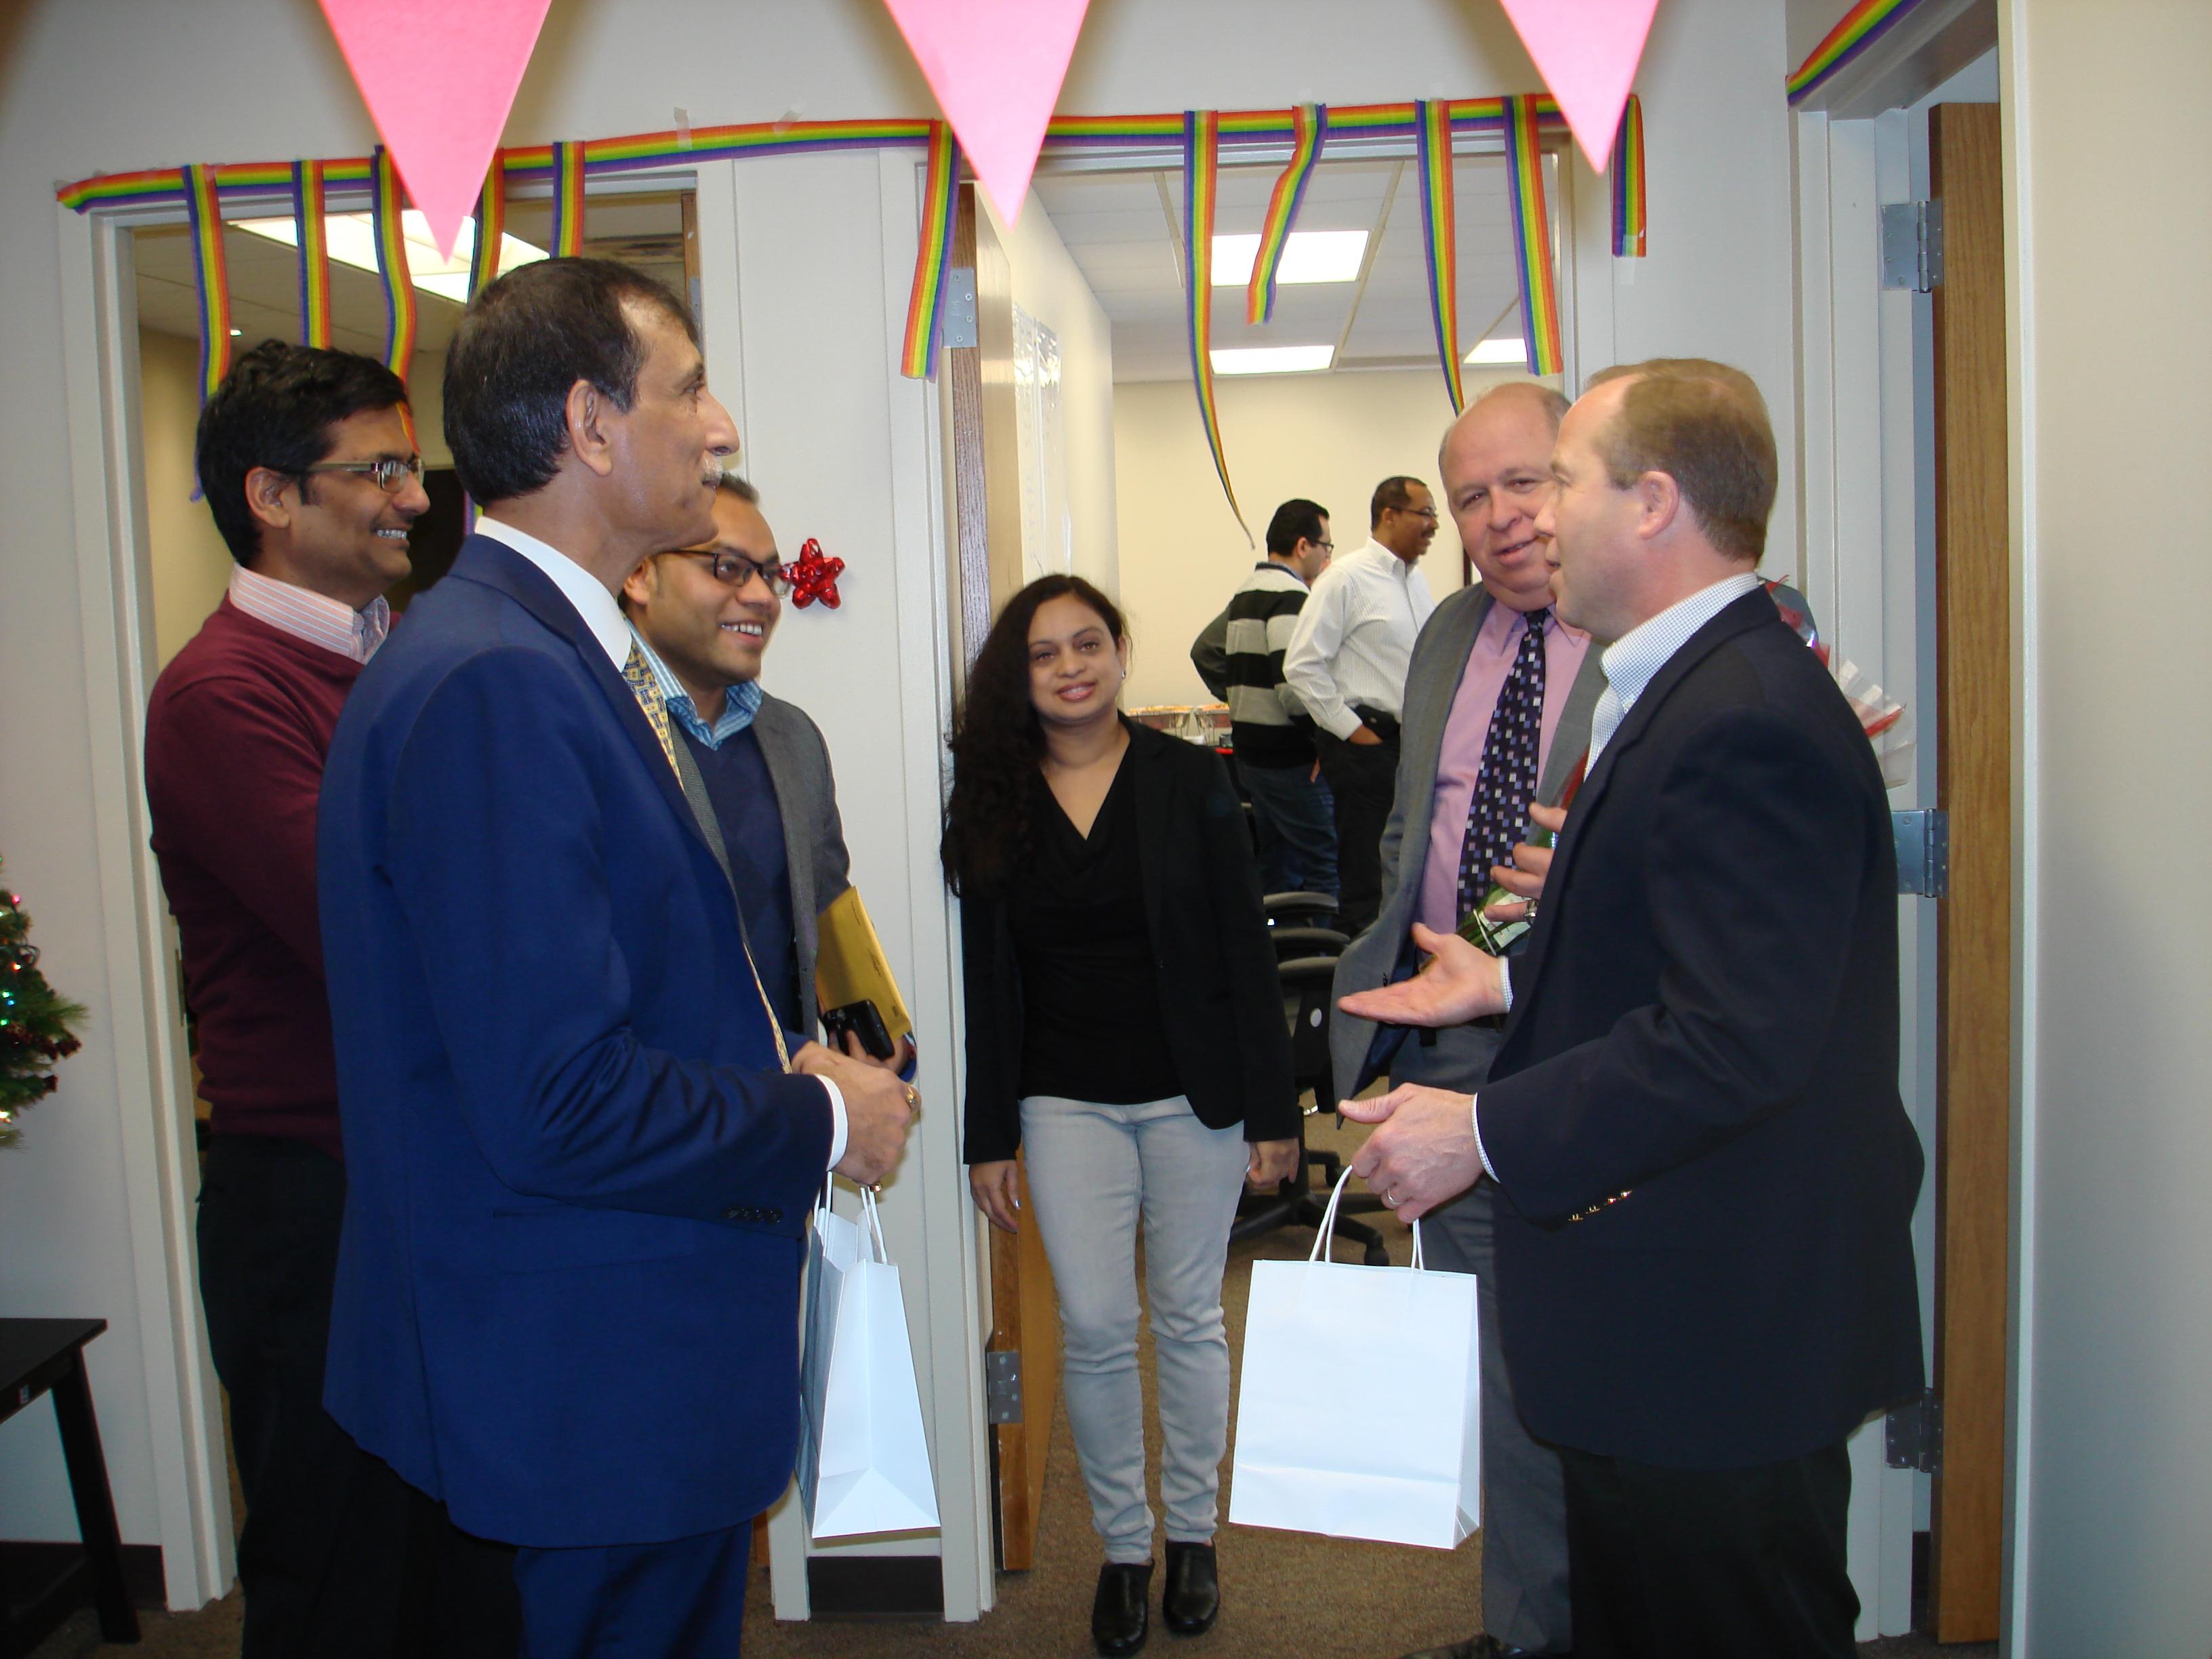 Mayor Barberio with Hadoop Express staff